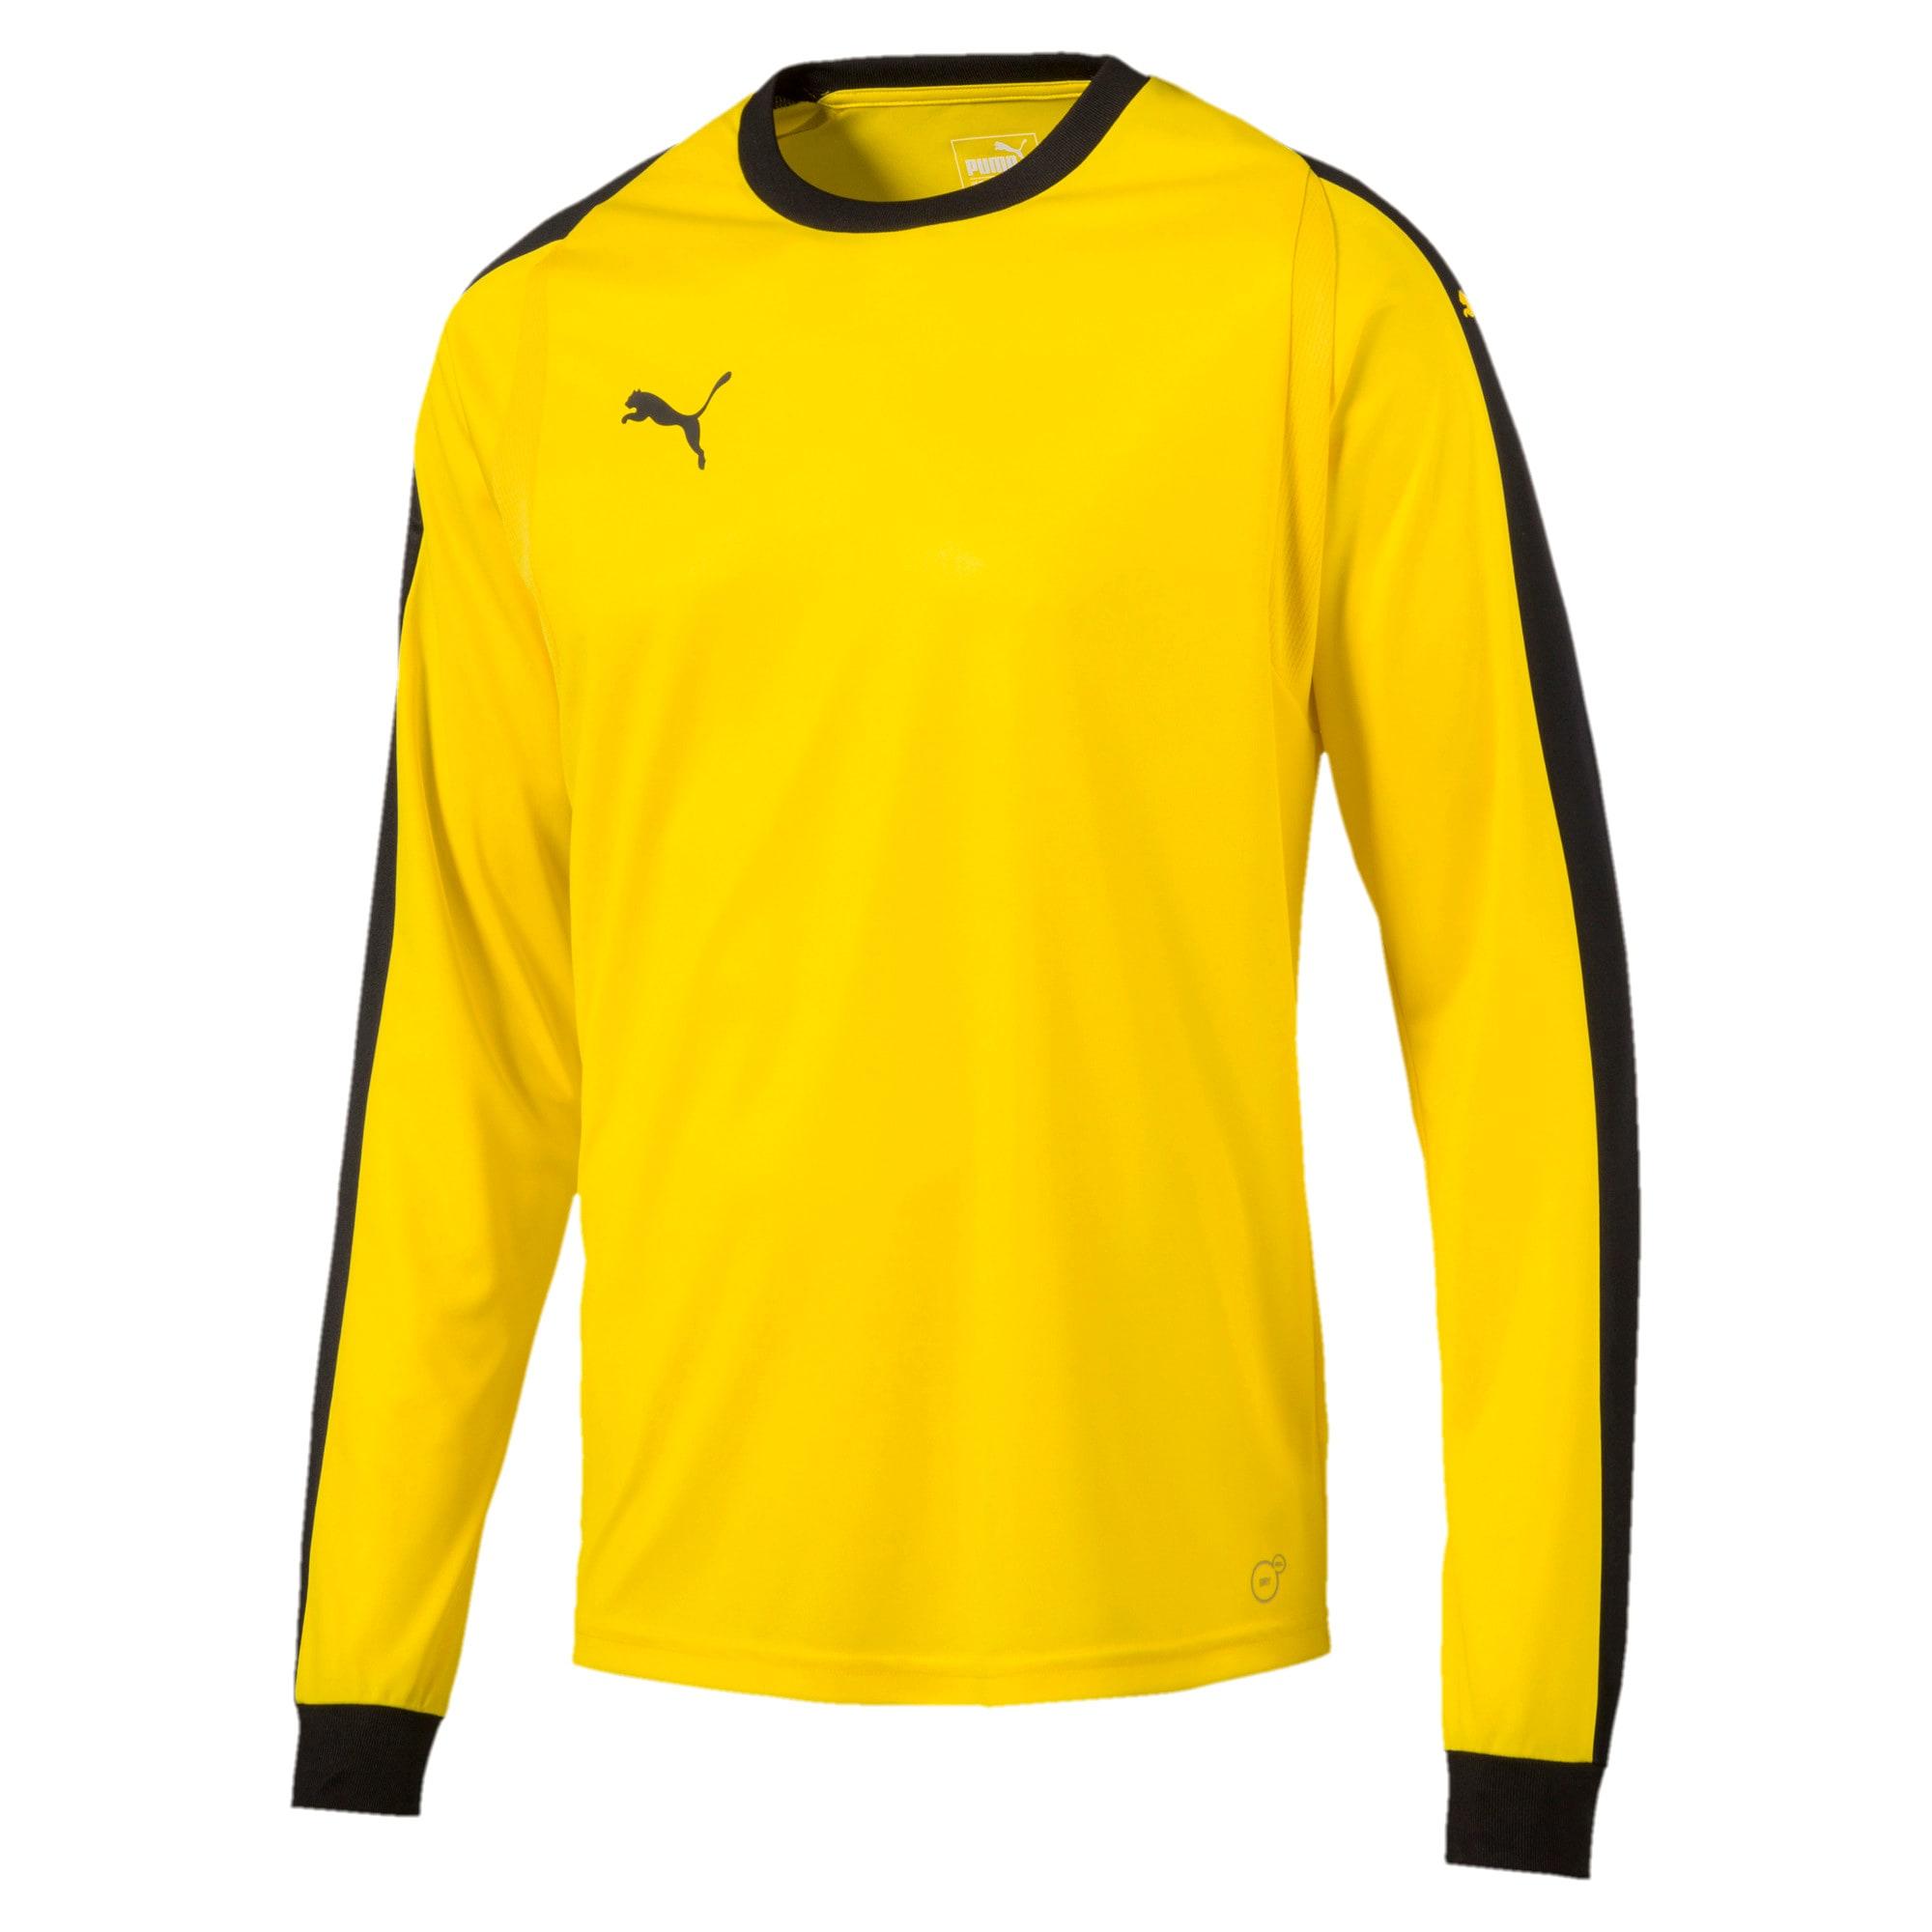 Thumbnail 1 of LIGA Long Sleeve Men's Football Goalkeeper Jersey, Cyber Yellow-Puma Black, medium